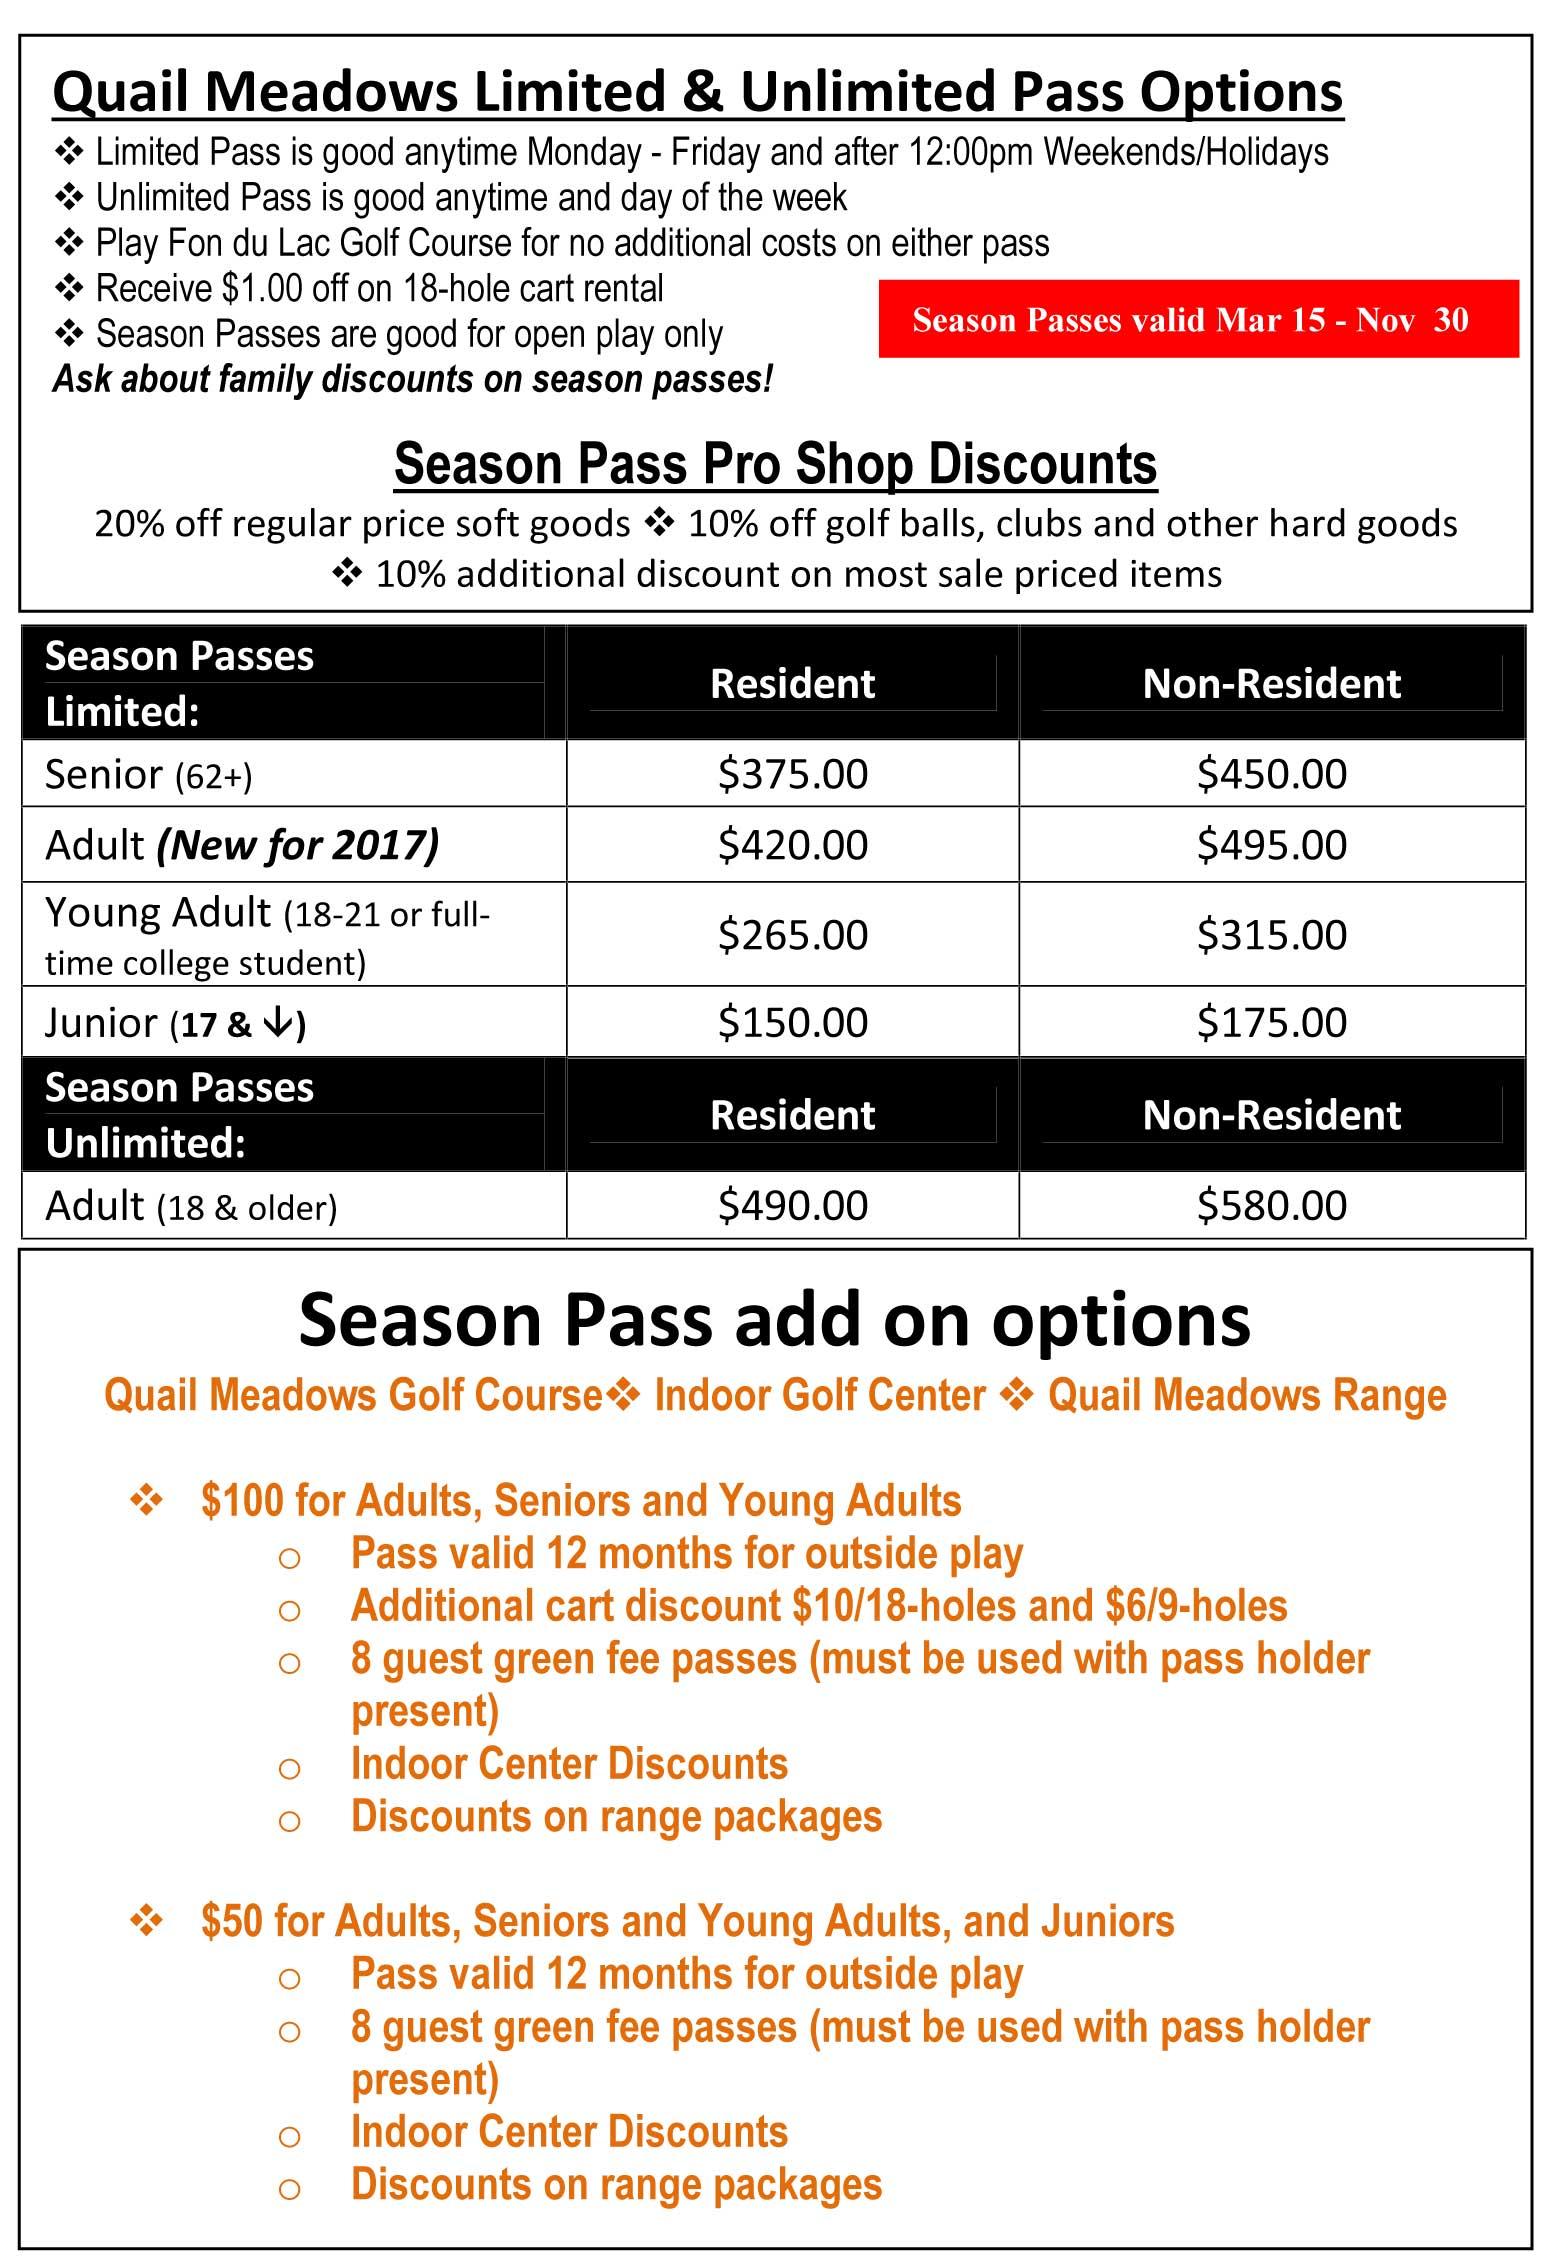 new-2017-season-pass-option